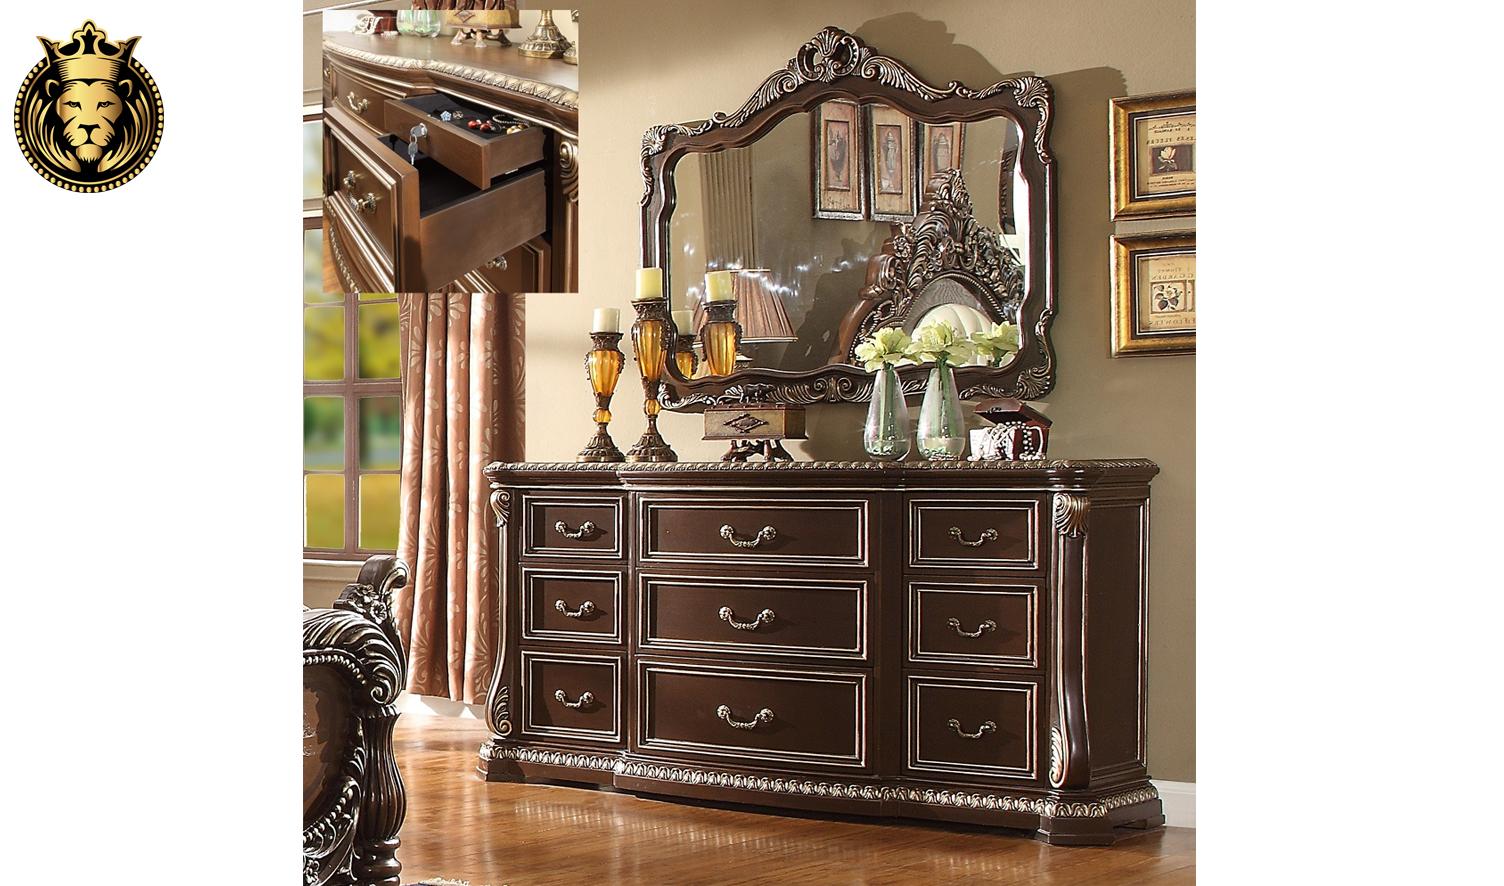 Handerson European Style Hand Carved Bedroom Set